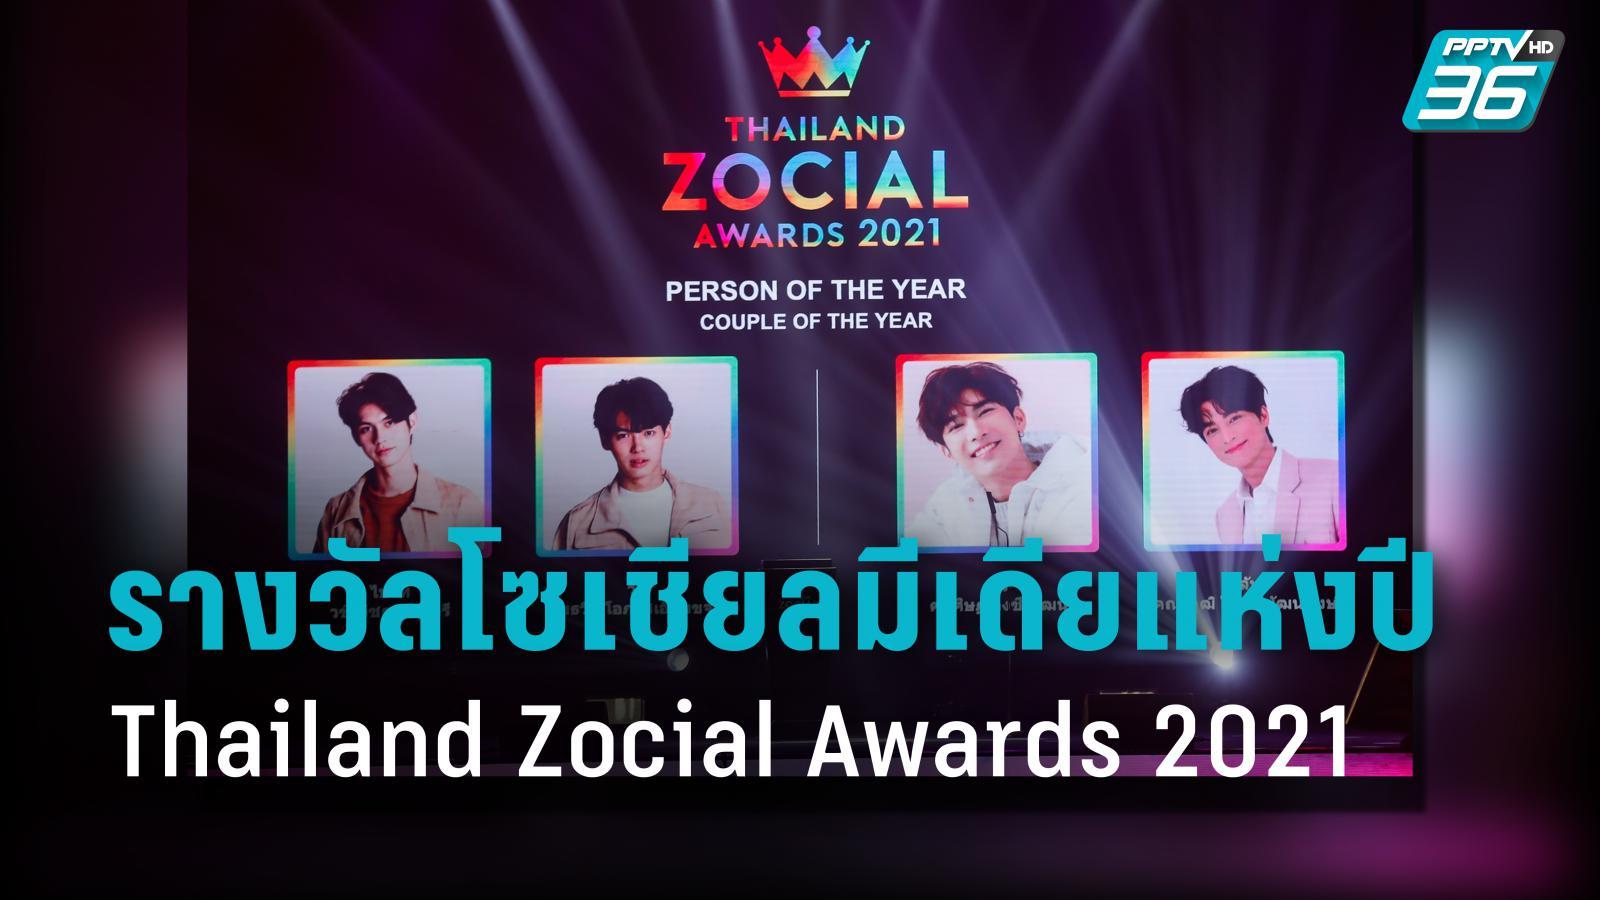 """THAILAND ZOCIAL AWARDS 2021"" รางวัลผู้ทรงอิทธิพลบนโซเชียลมีเดียแห่งปี"